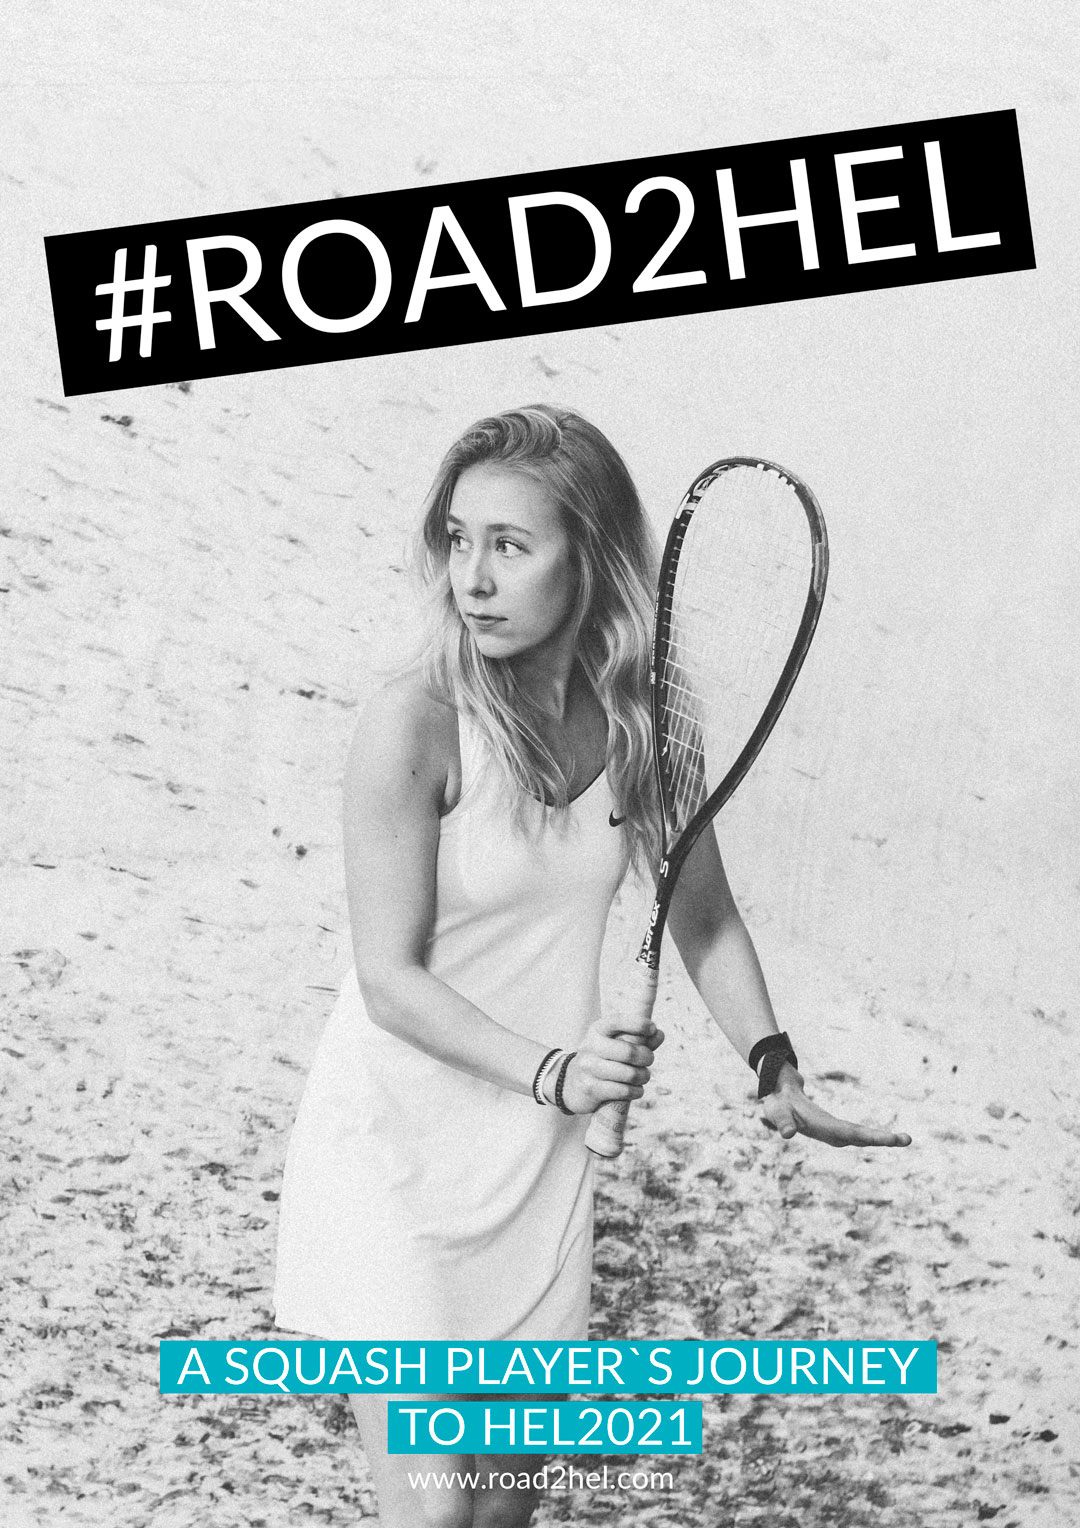 Emilia_Soini_Squash_Player_Finland_road2hel